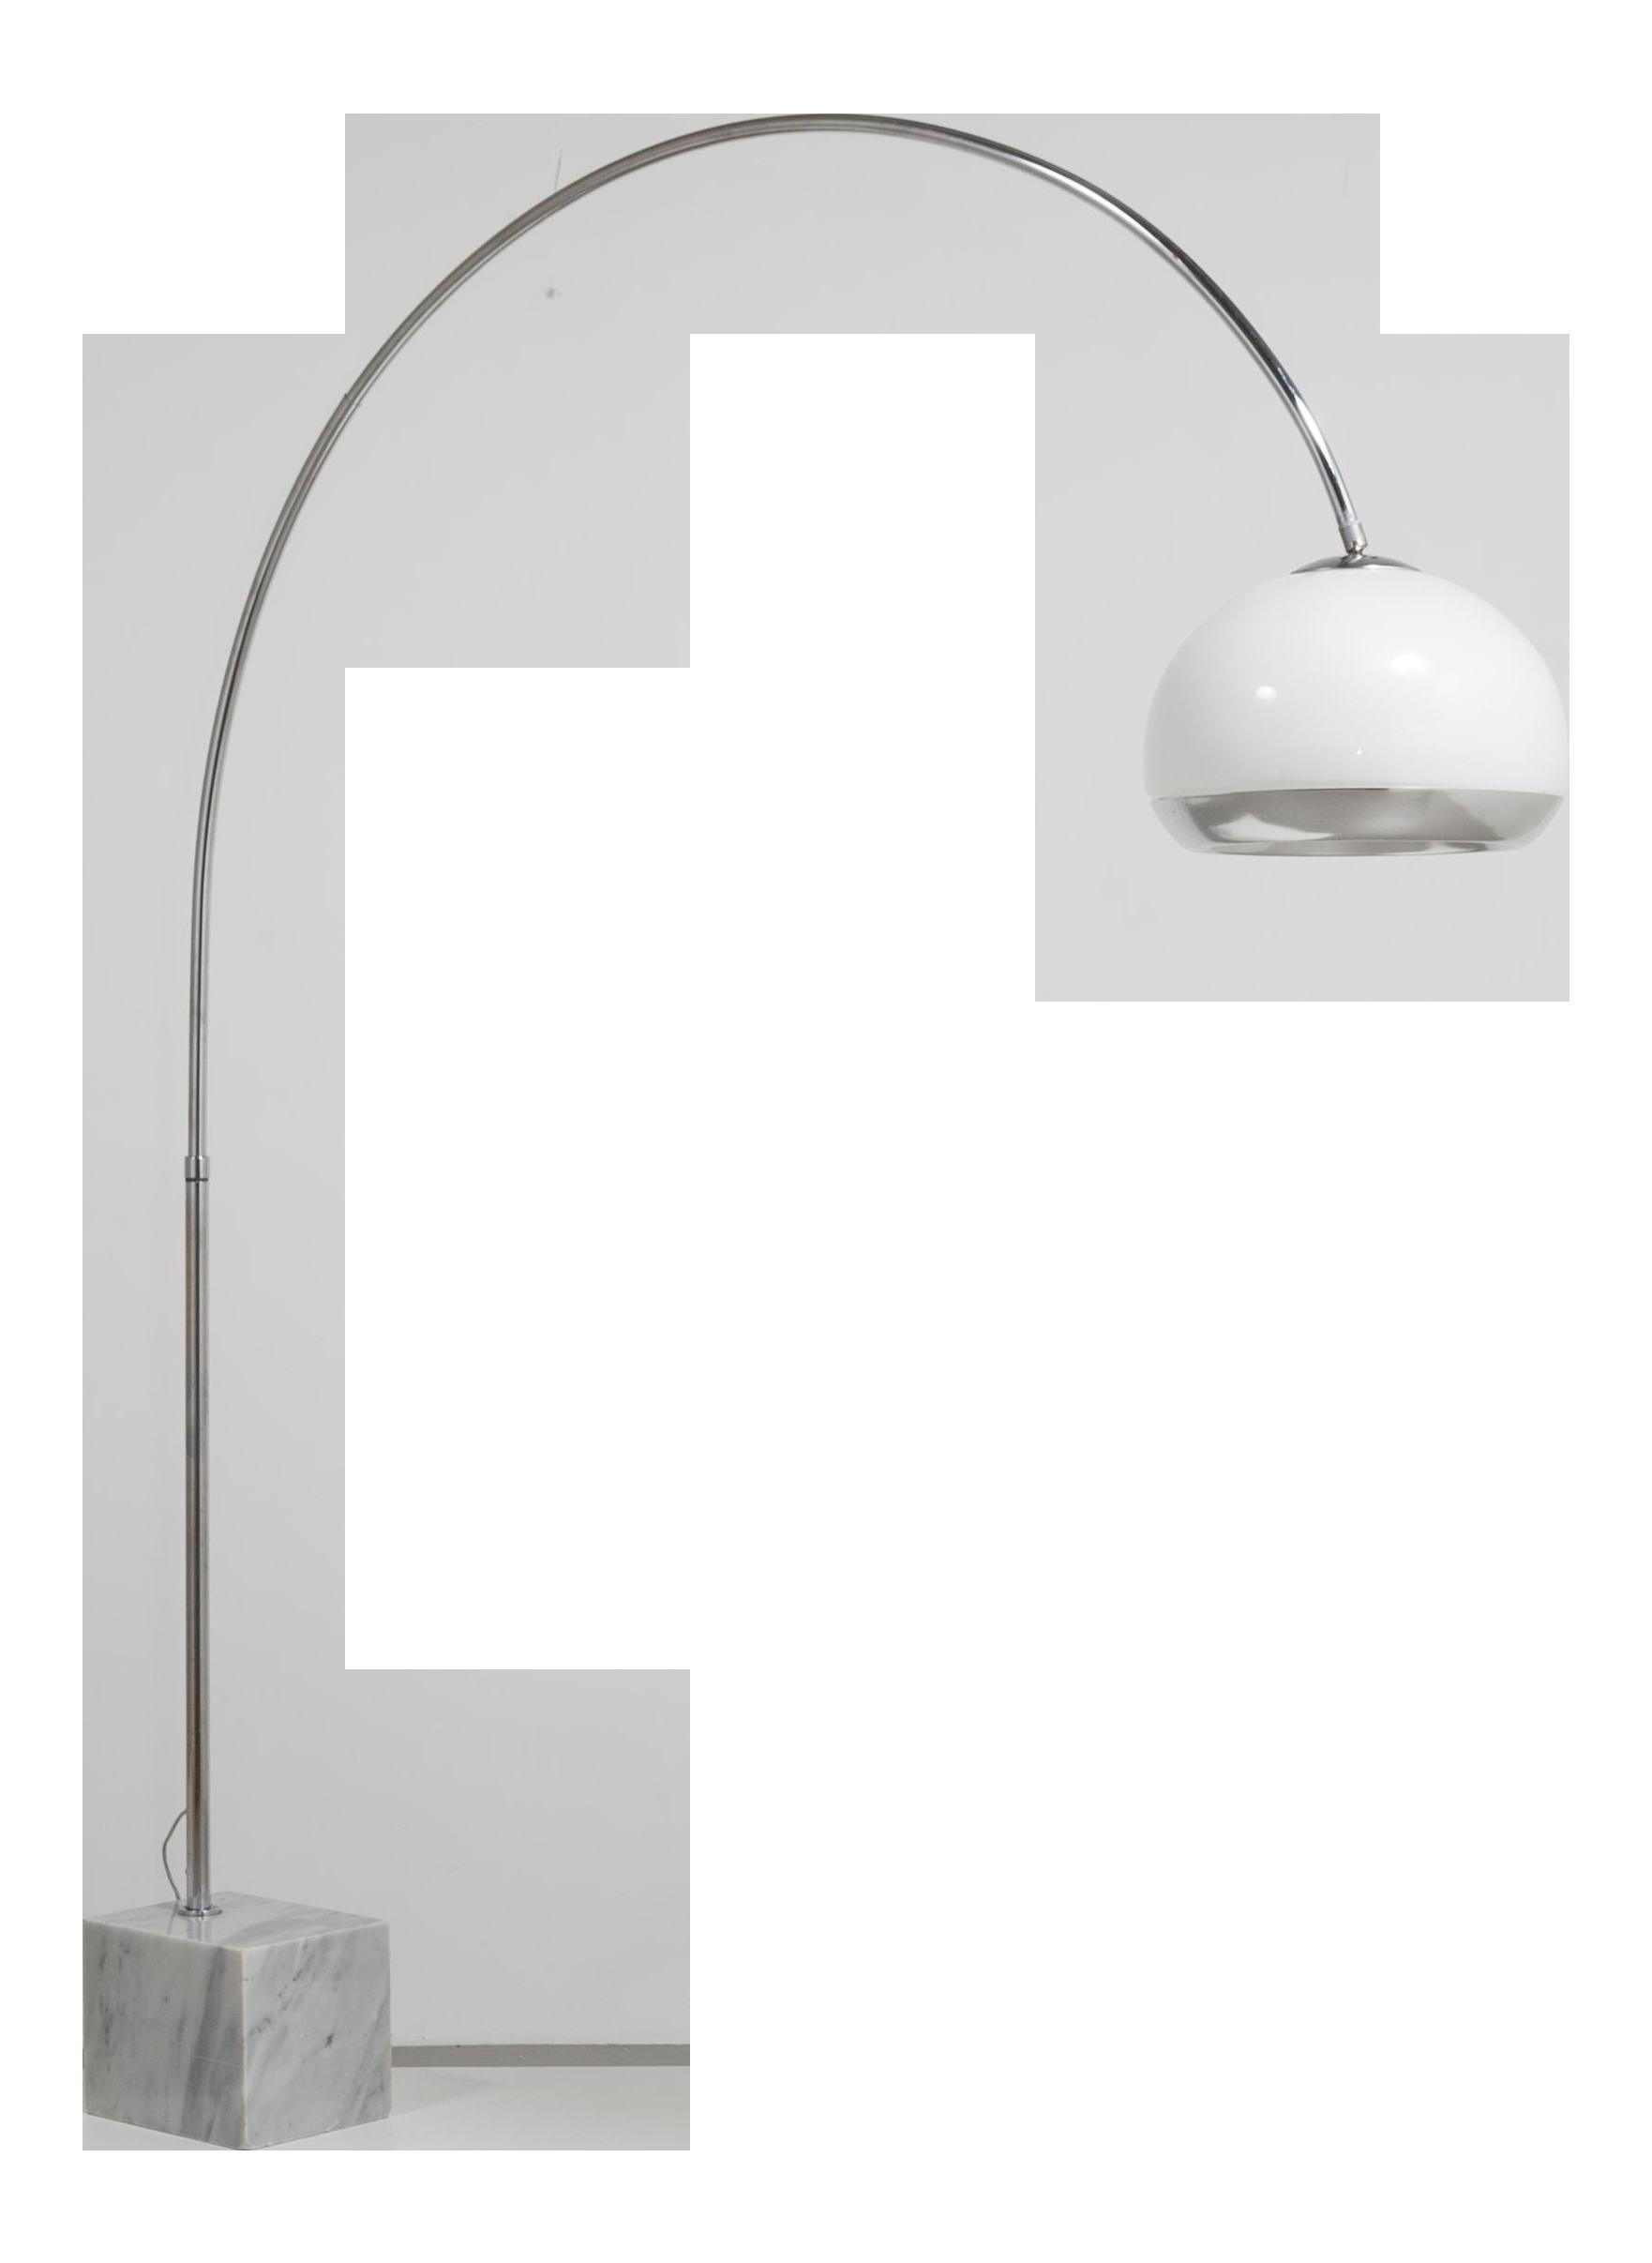 Excellent An Original Harvey Guzzini for Laurel Arco Floor Lamp ... for Original Arco Lamp  146hul